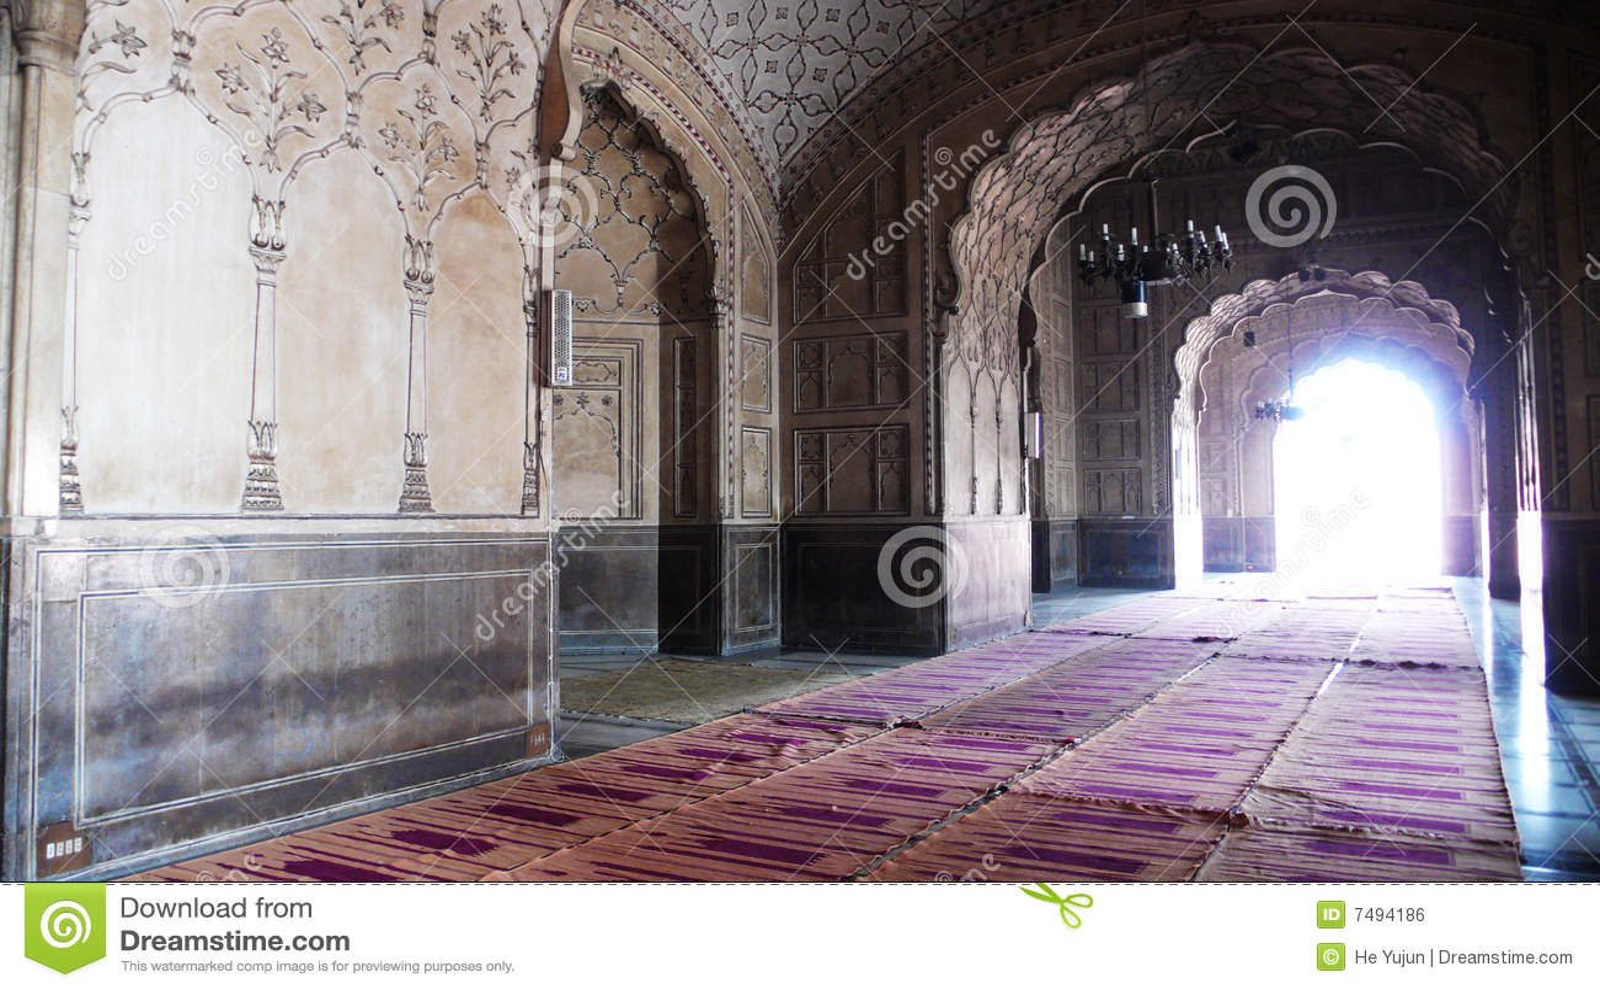 inside-badshahi-mosque-7494186 jpgInside Badshahi Mosque